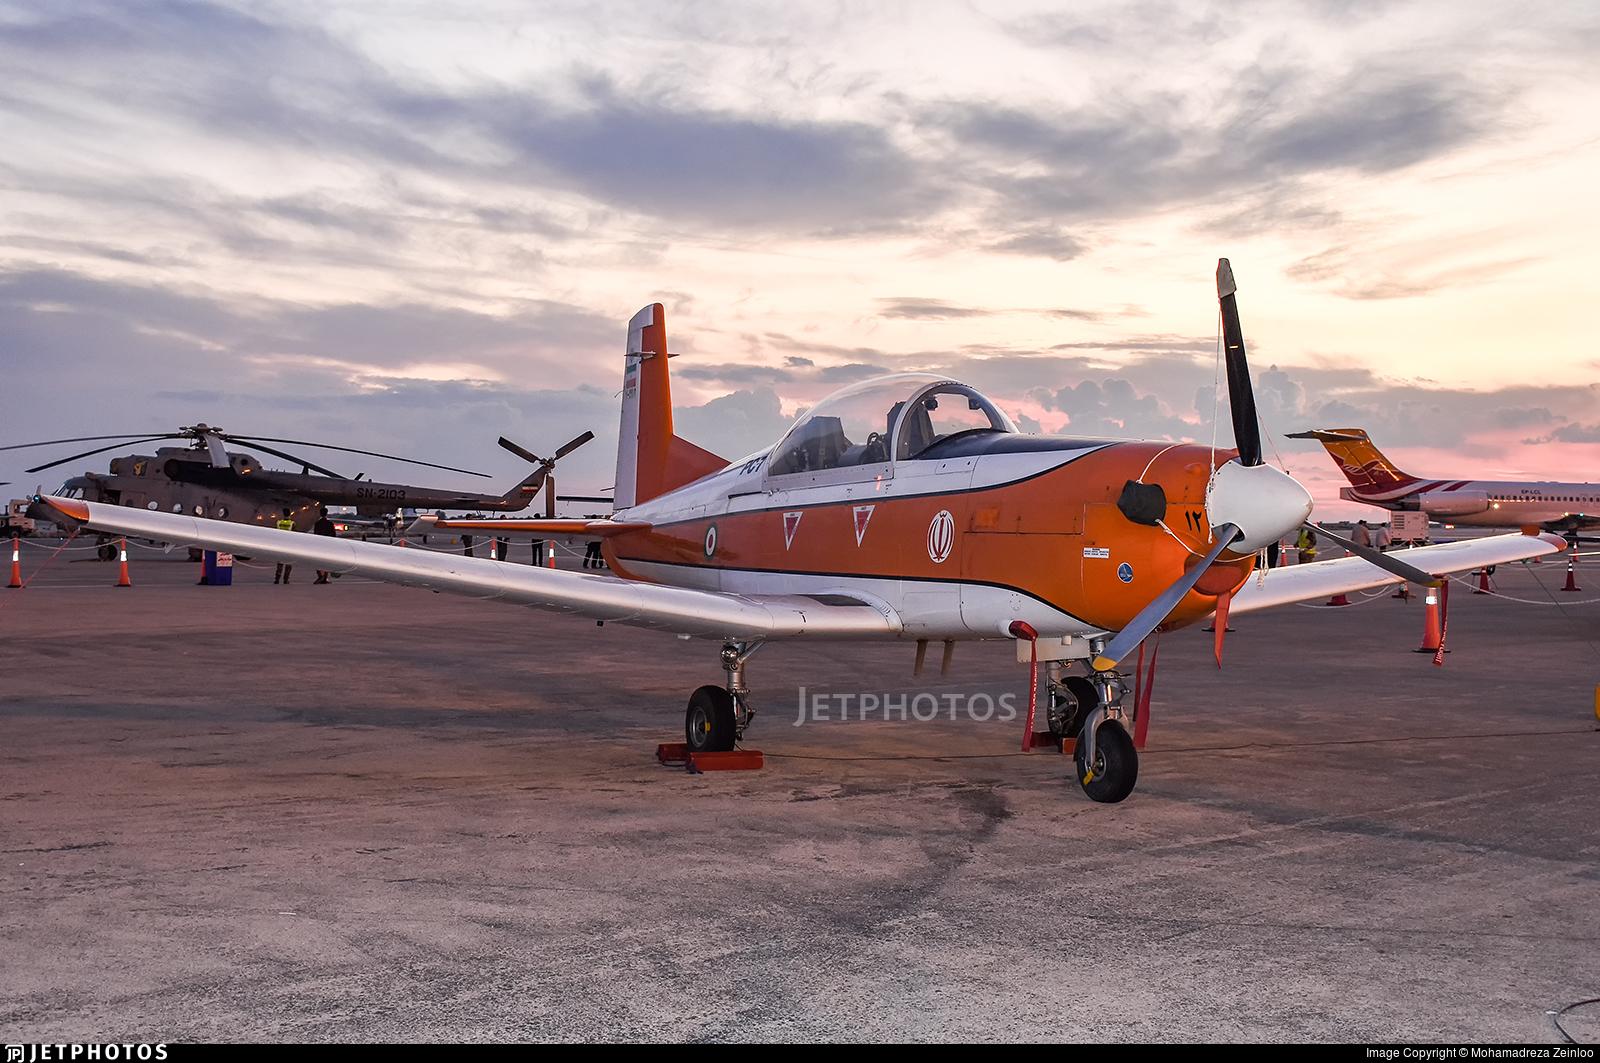 7-9912 - Pilatus PC-7 - Iran - Air Force